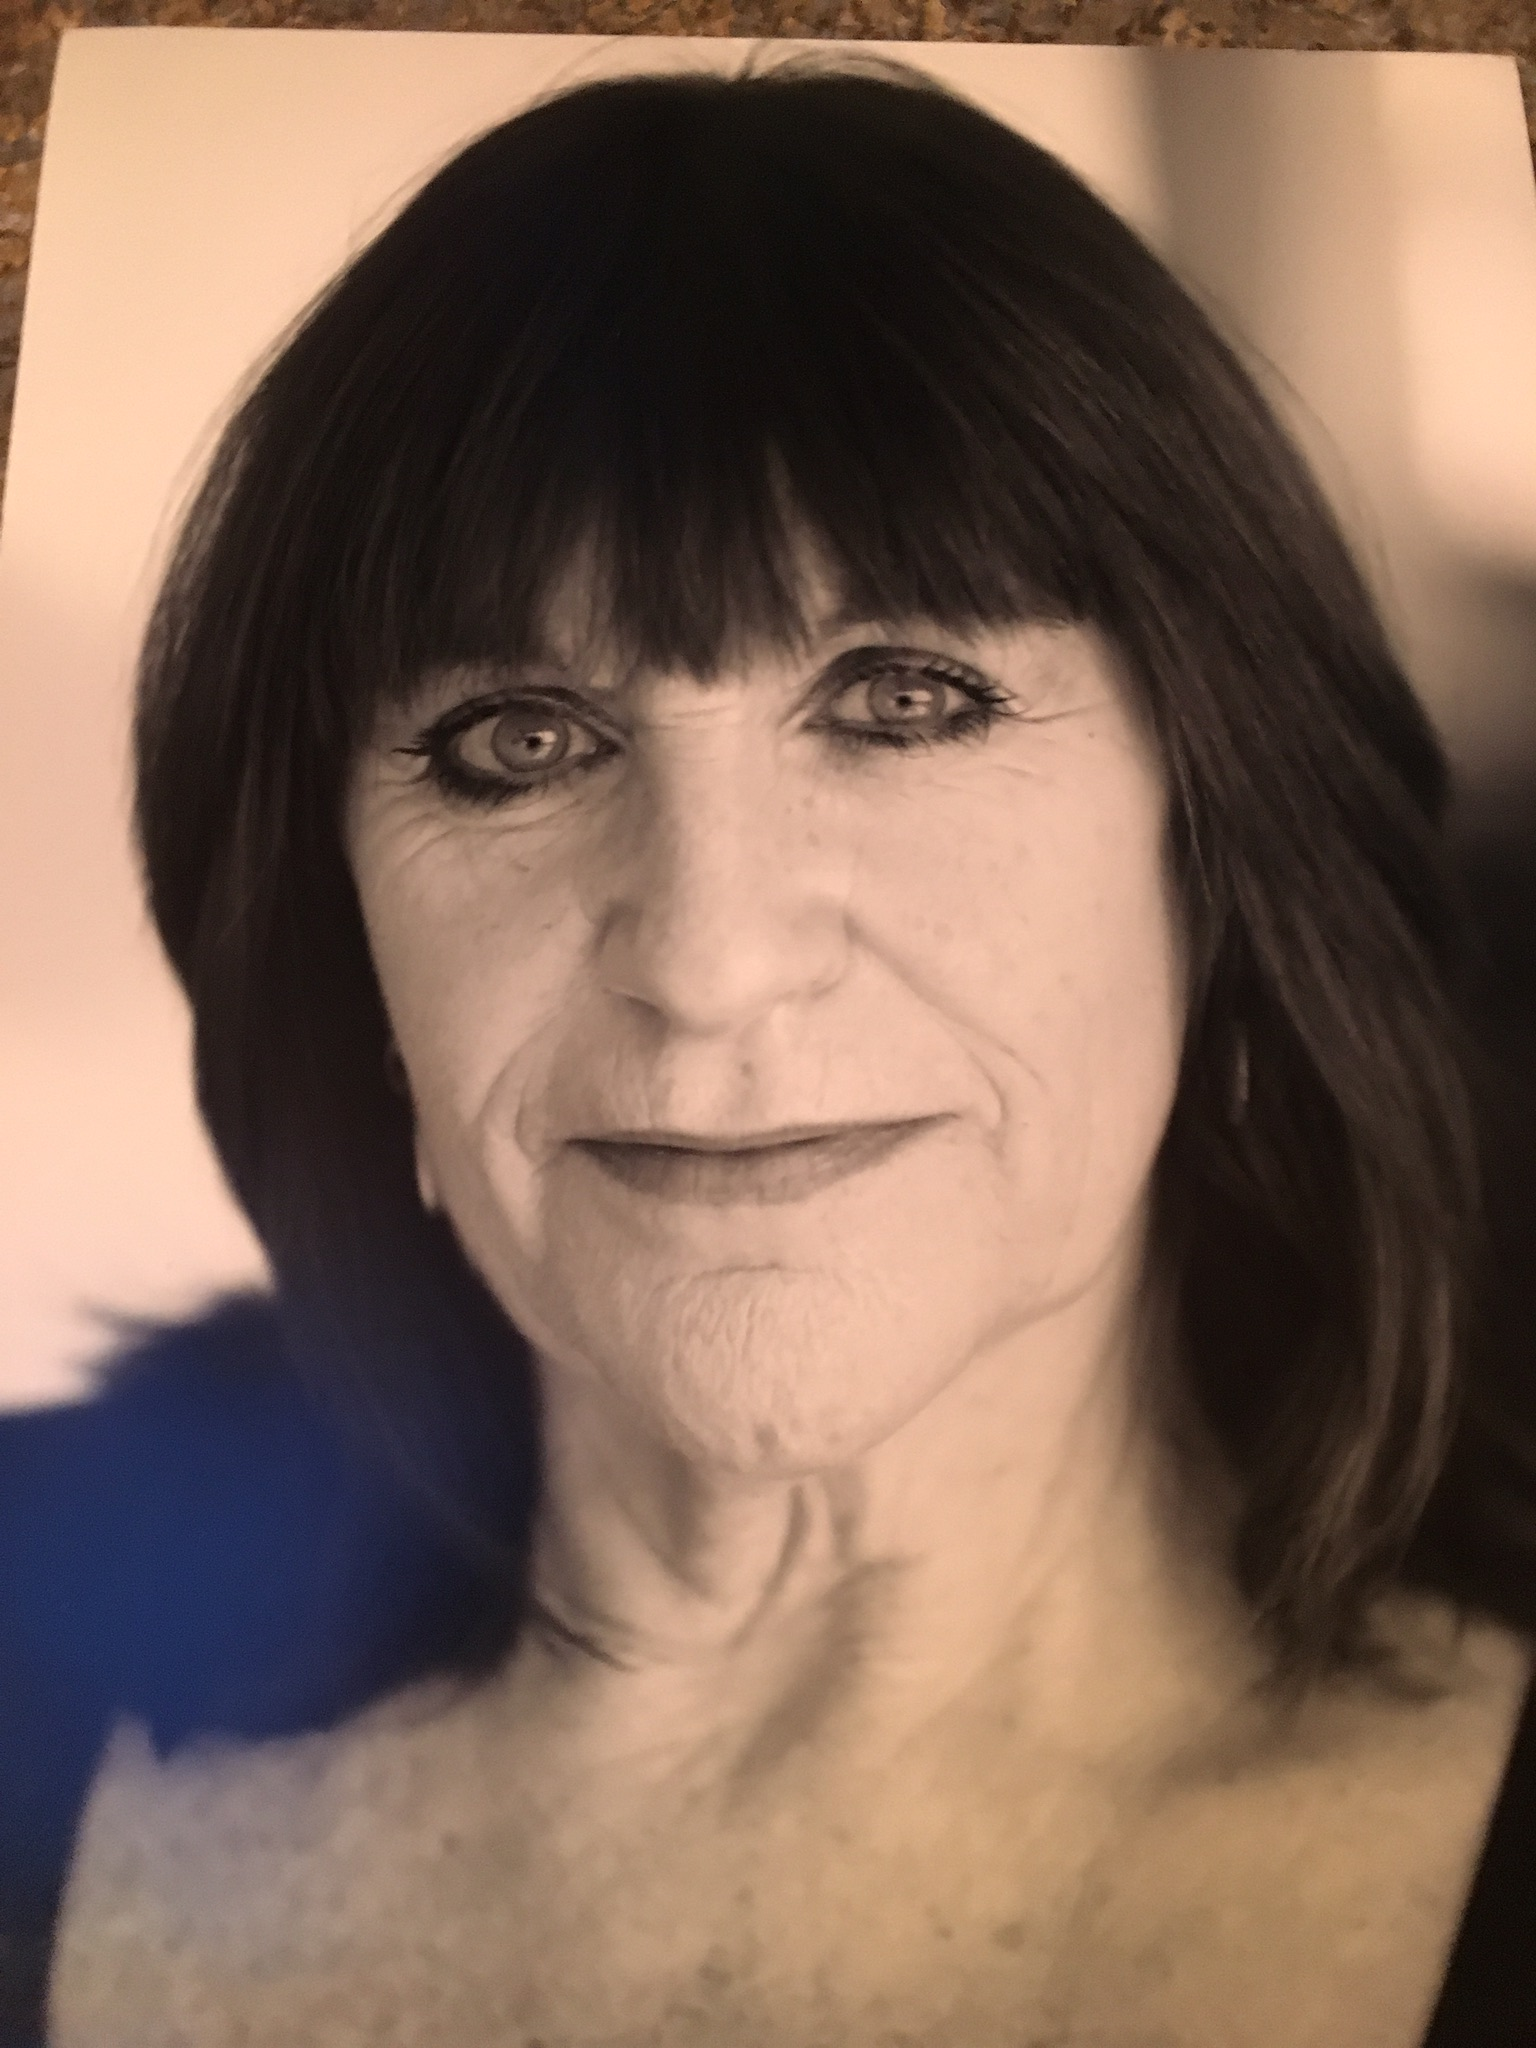 Lisa Maxwell (actress),Heather Bambrick Sex video Nicky Henson (born 1945),Deborah Lacey